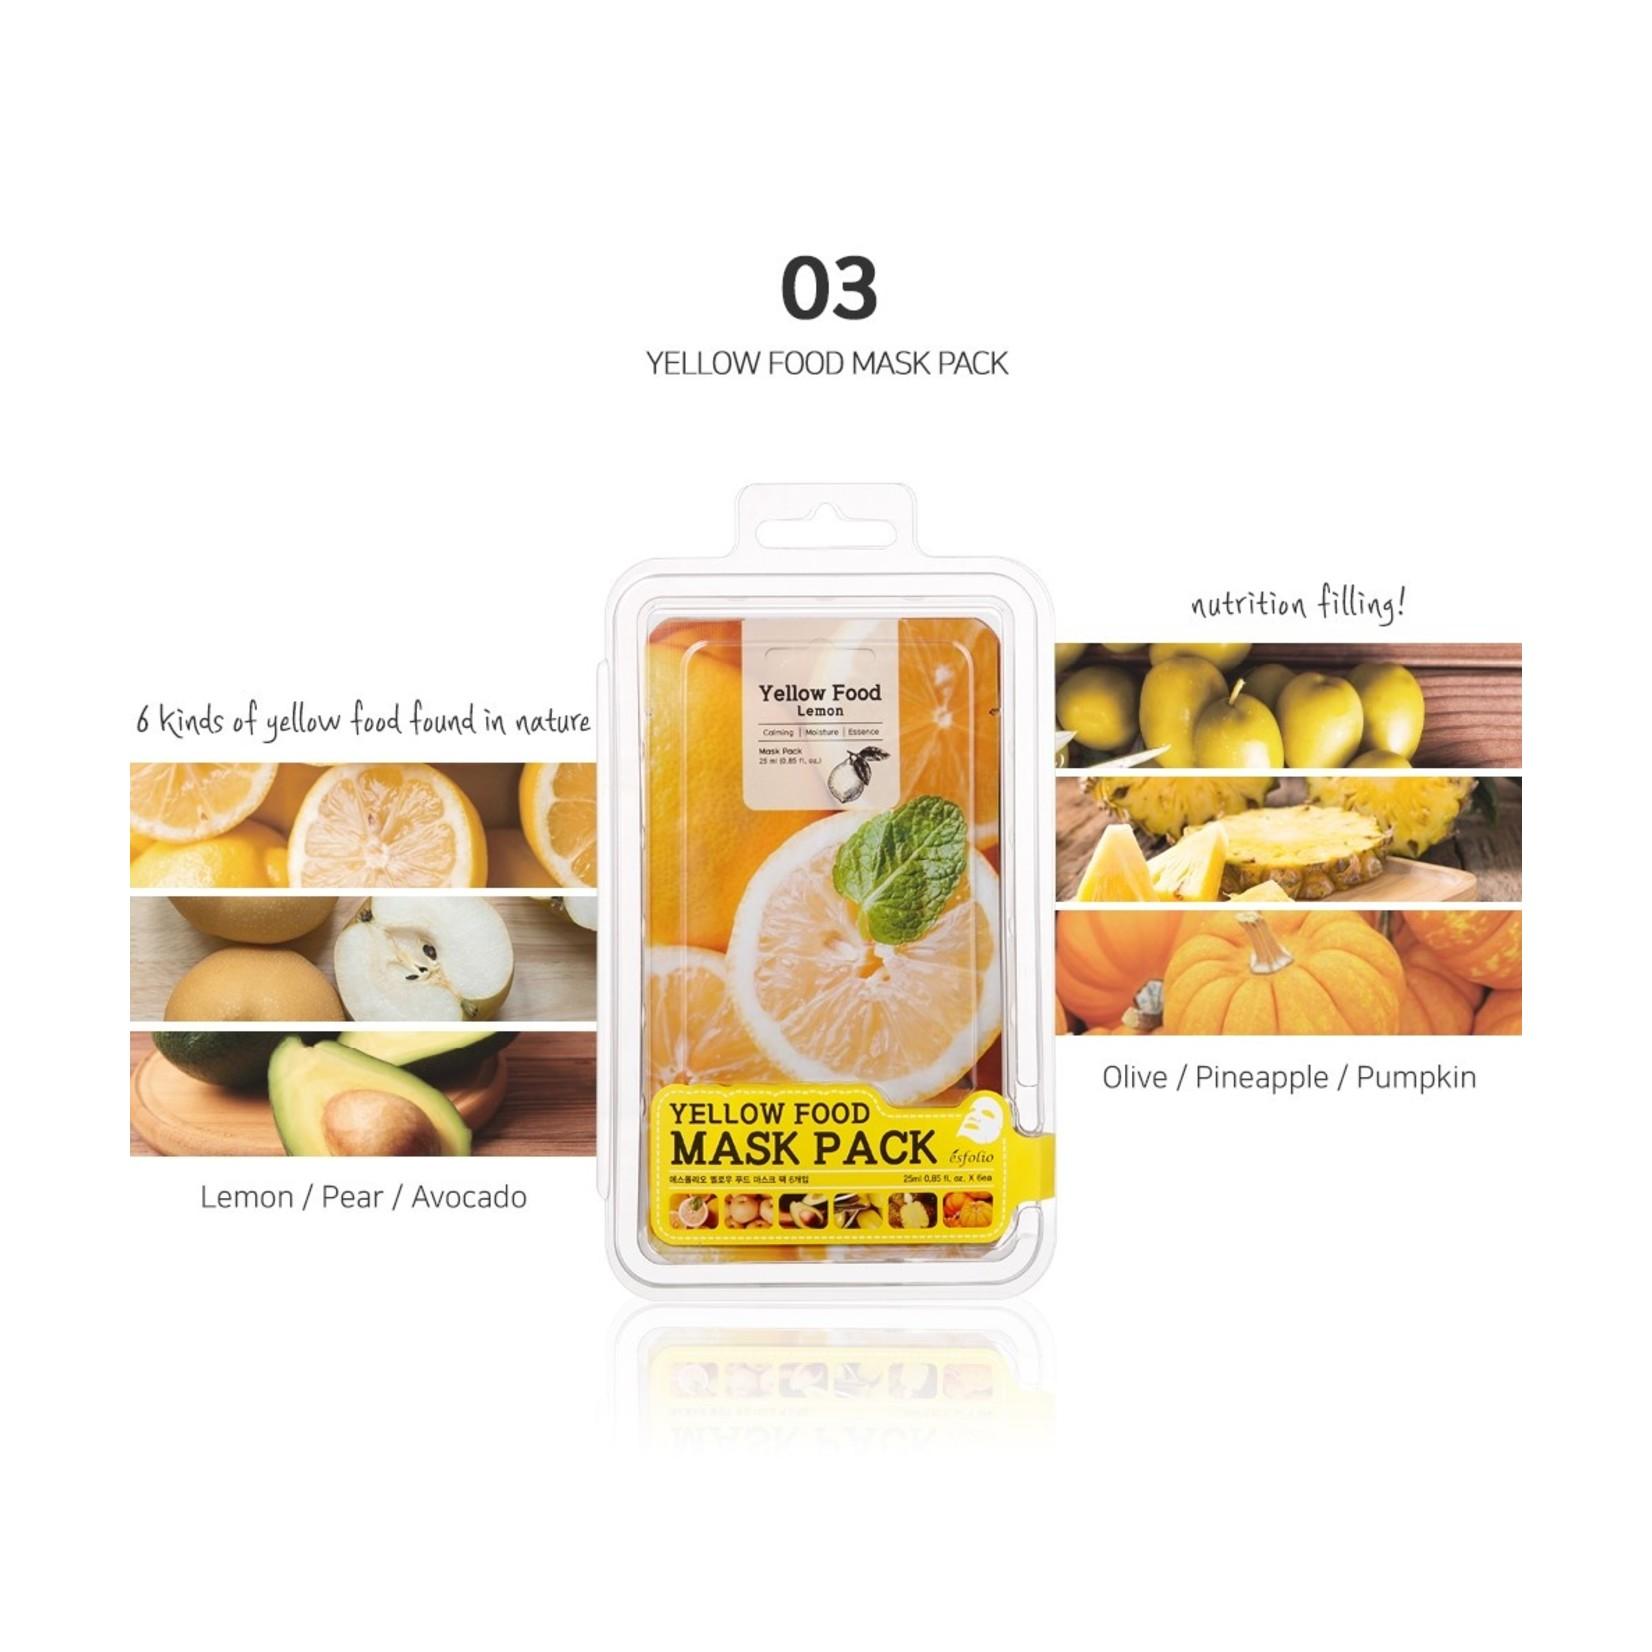 esfolio Yellow Food Pumpkin Mask